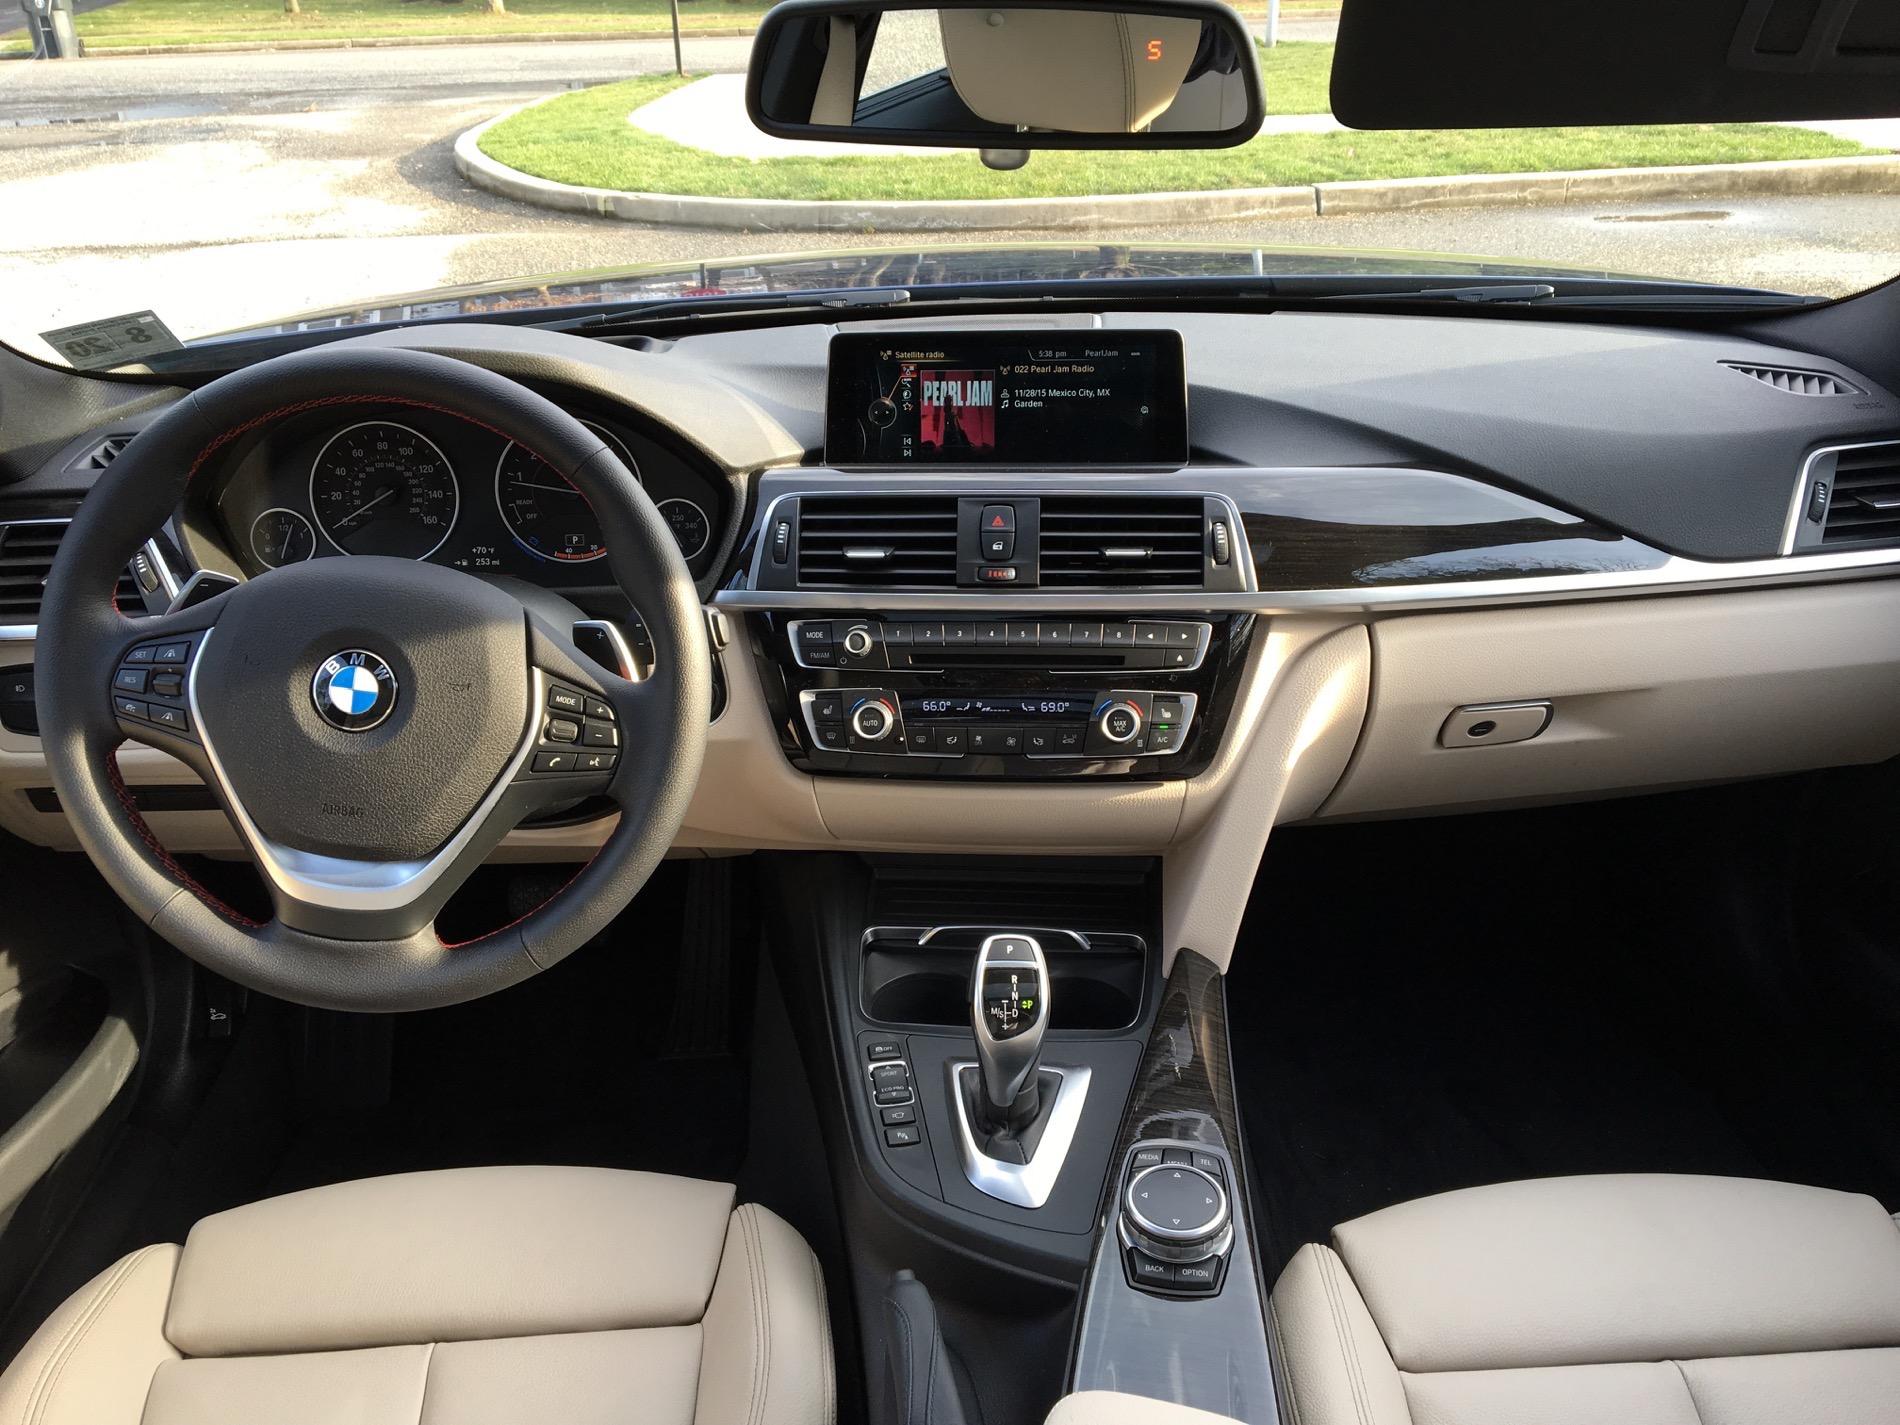 driving comparison 2016 bmw 328i vs 2016 audi a4 rh bmwblog com 2008 BMW 328Xi 2011 BMW 328Xi